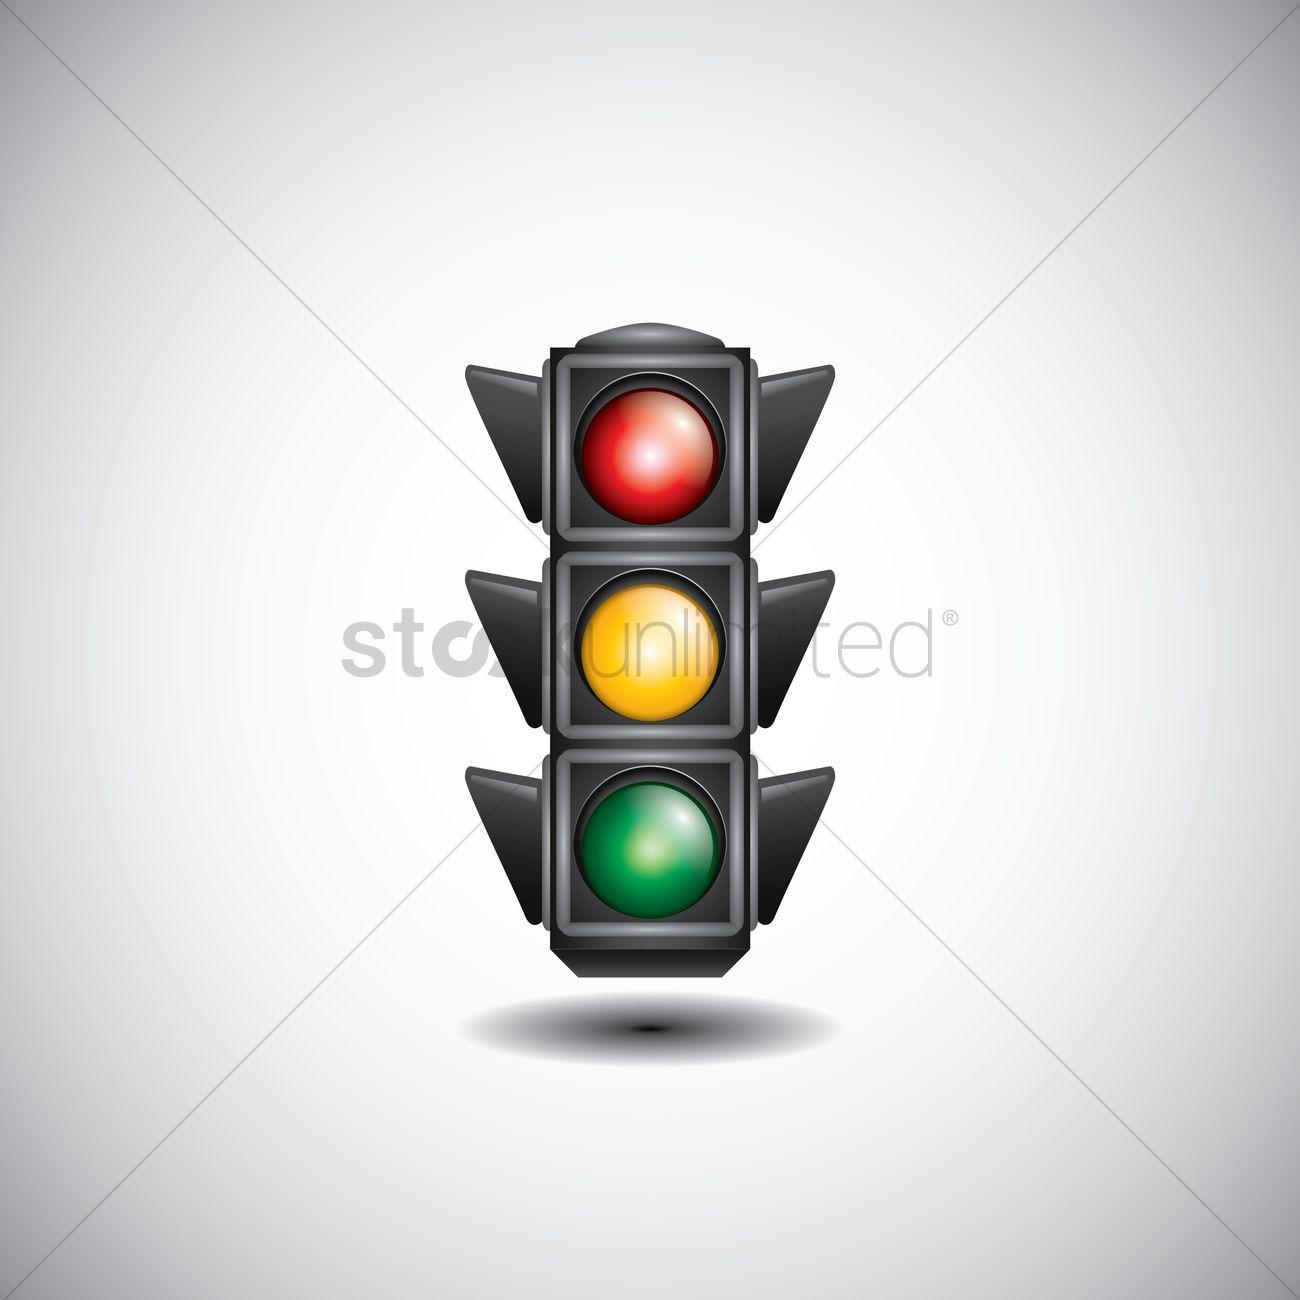 Traffic Light Vector Illustration Affiliate Light Traffic Illustration Vector Affiliate Novelty Lamp Lamp Table Lamp